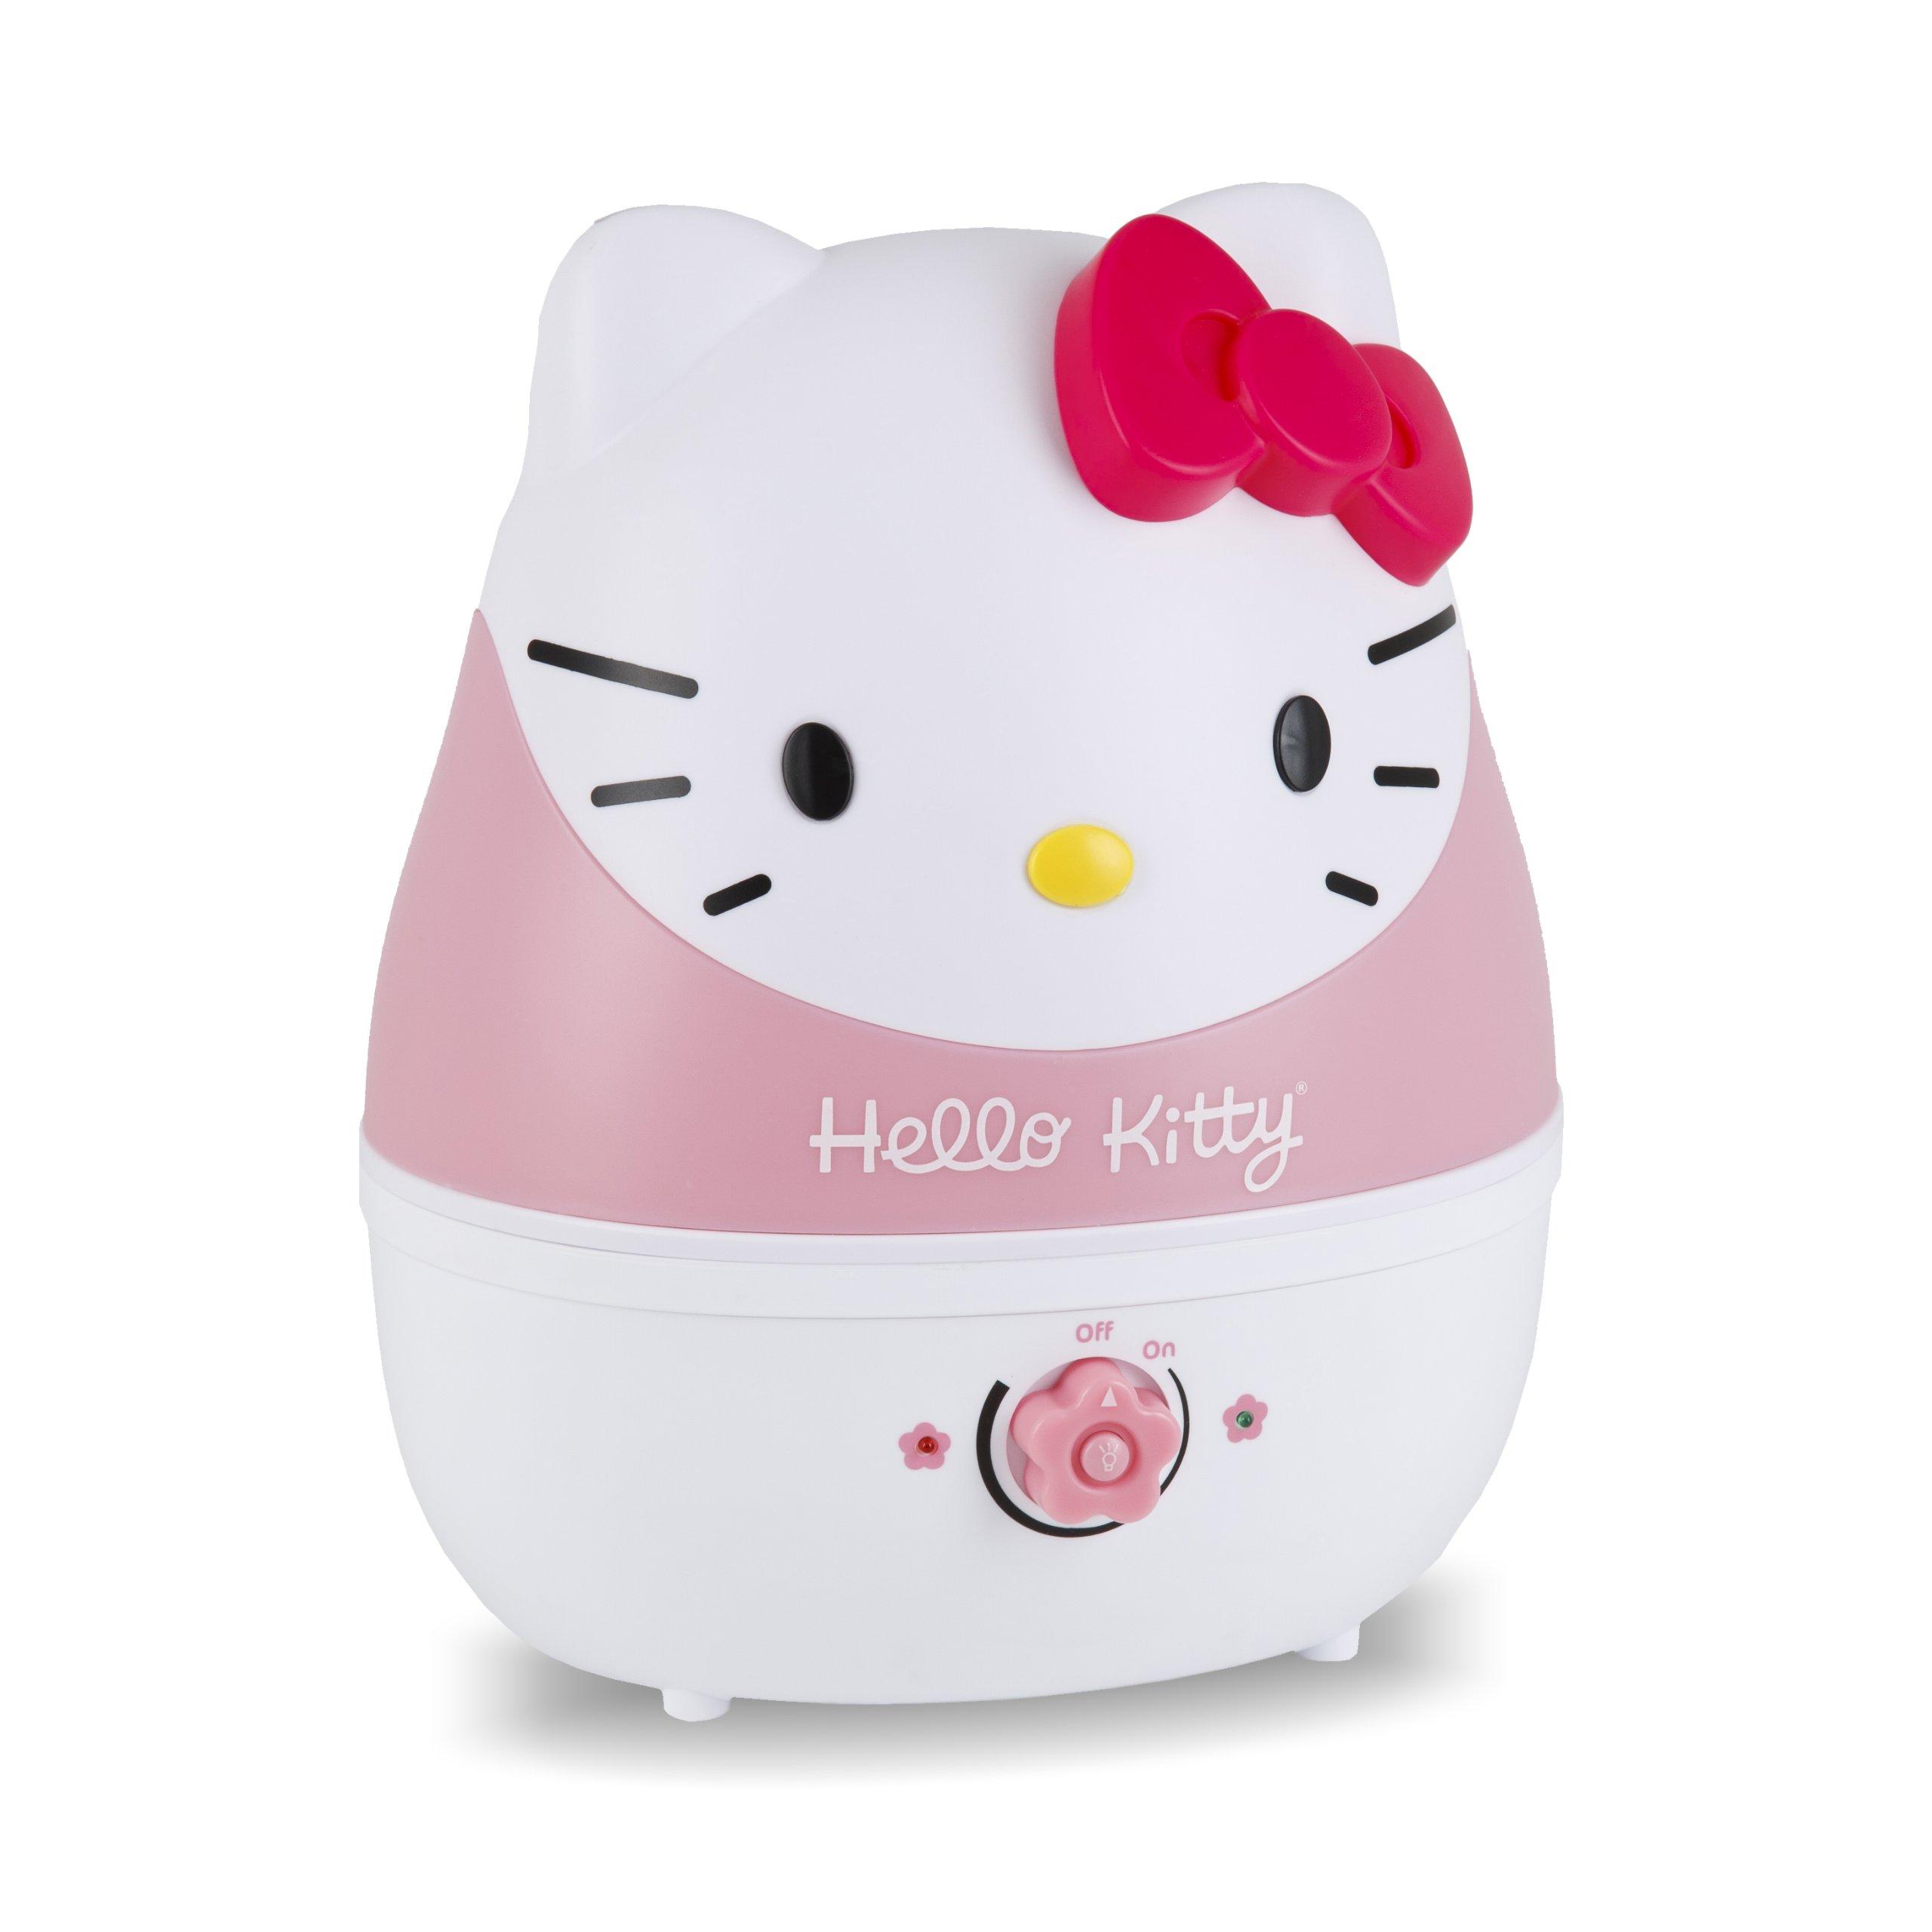 Crane USA Cool Mist Humidifiers for Kids, Hello Kitty